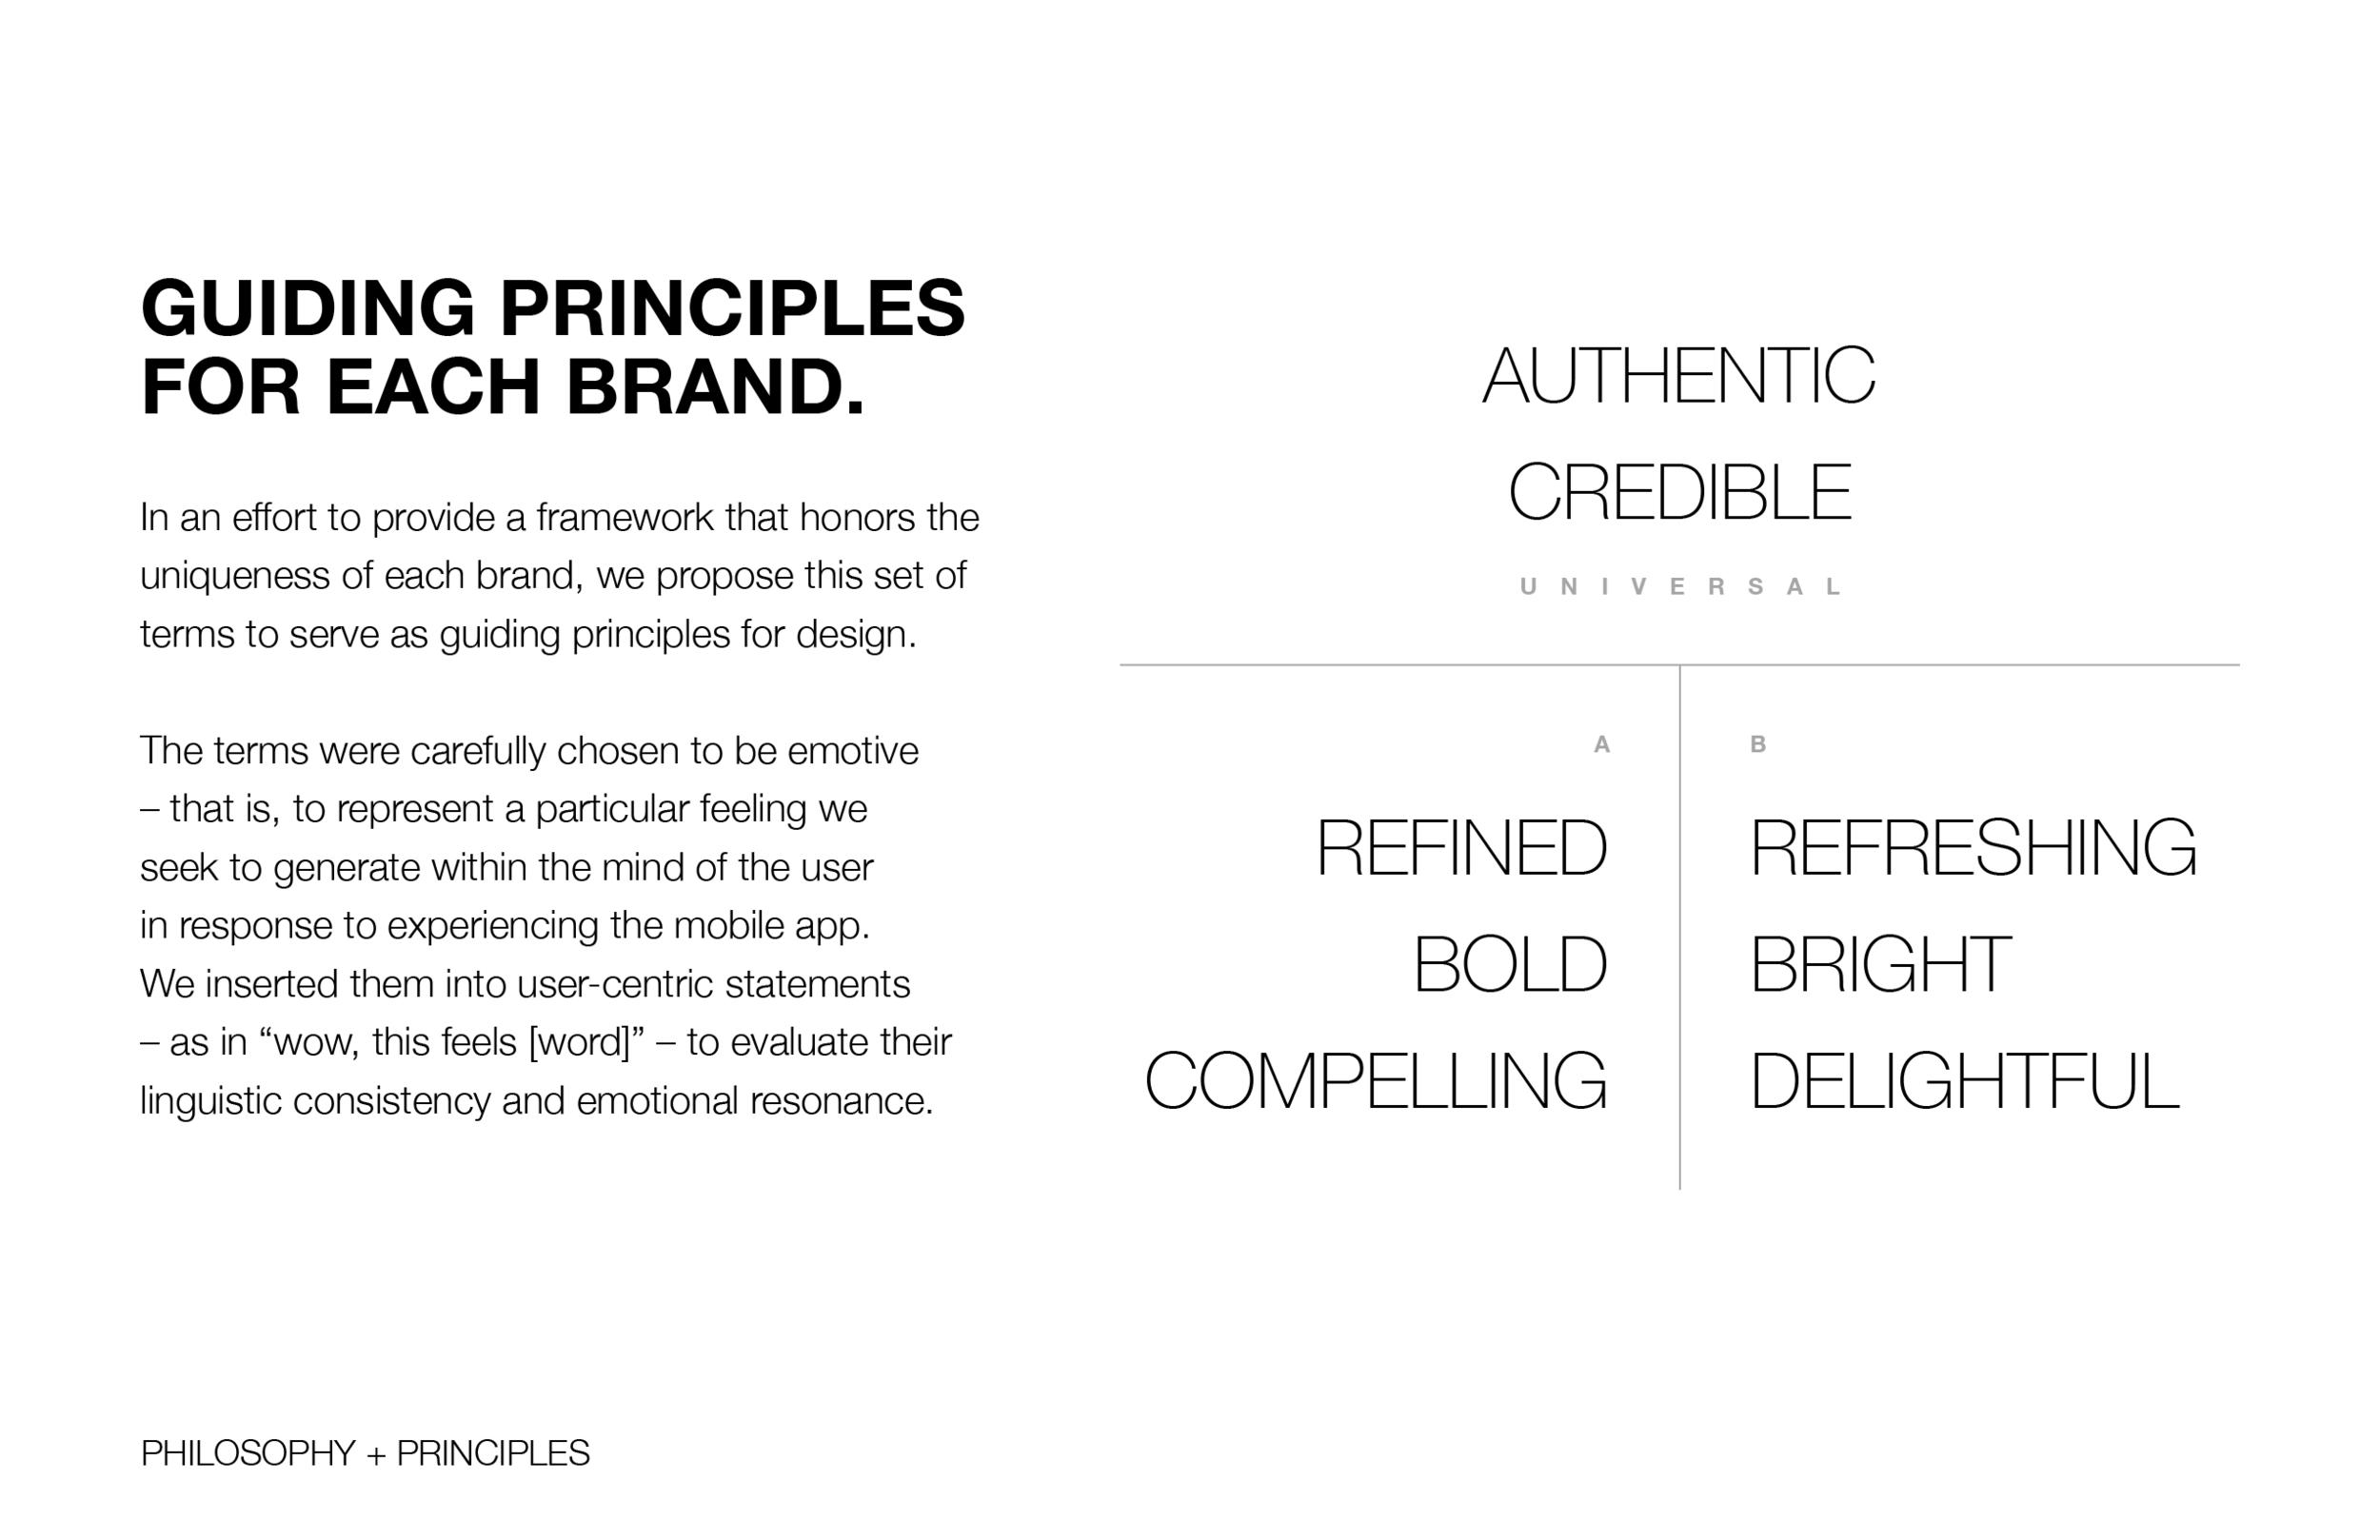 guidingPrinciples_REDACTED_page 04.png